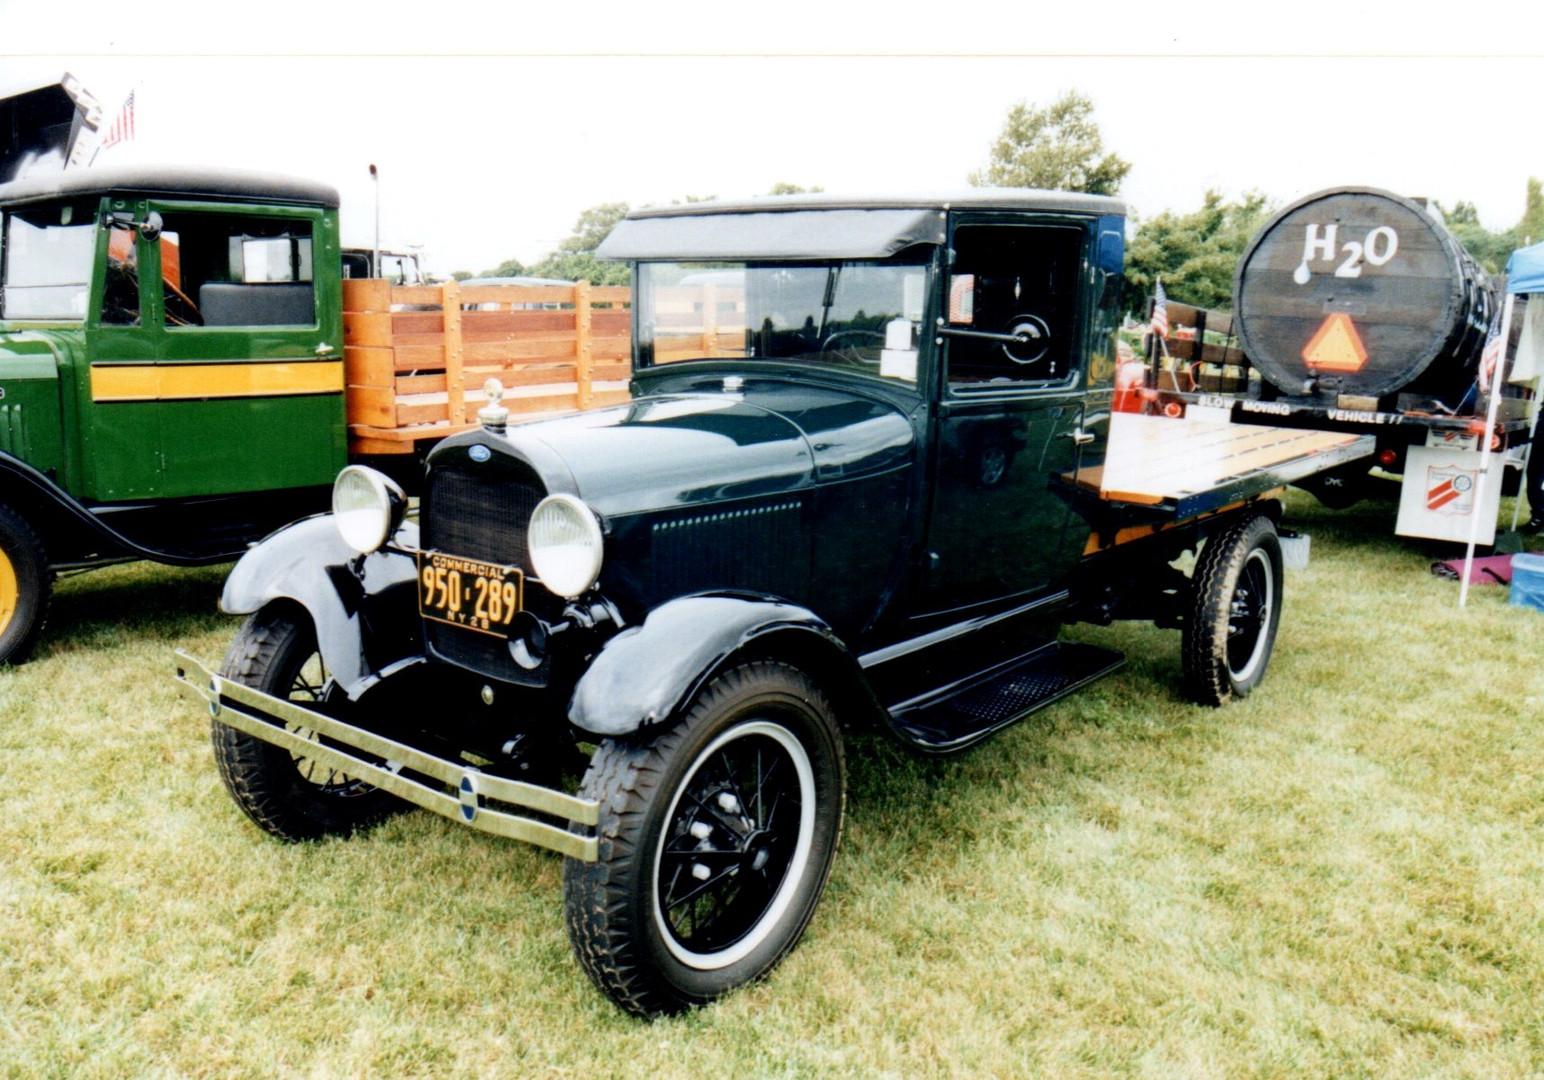 Michael Eliash's 1928 Ford flatbed